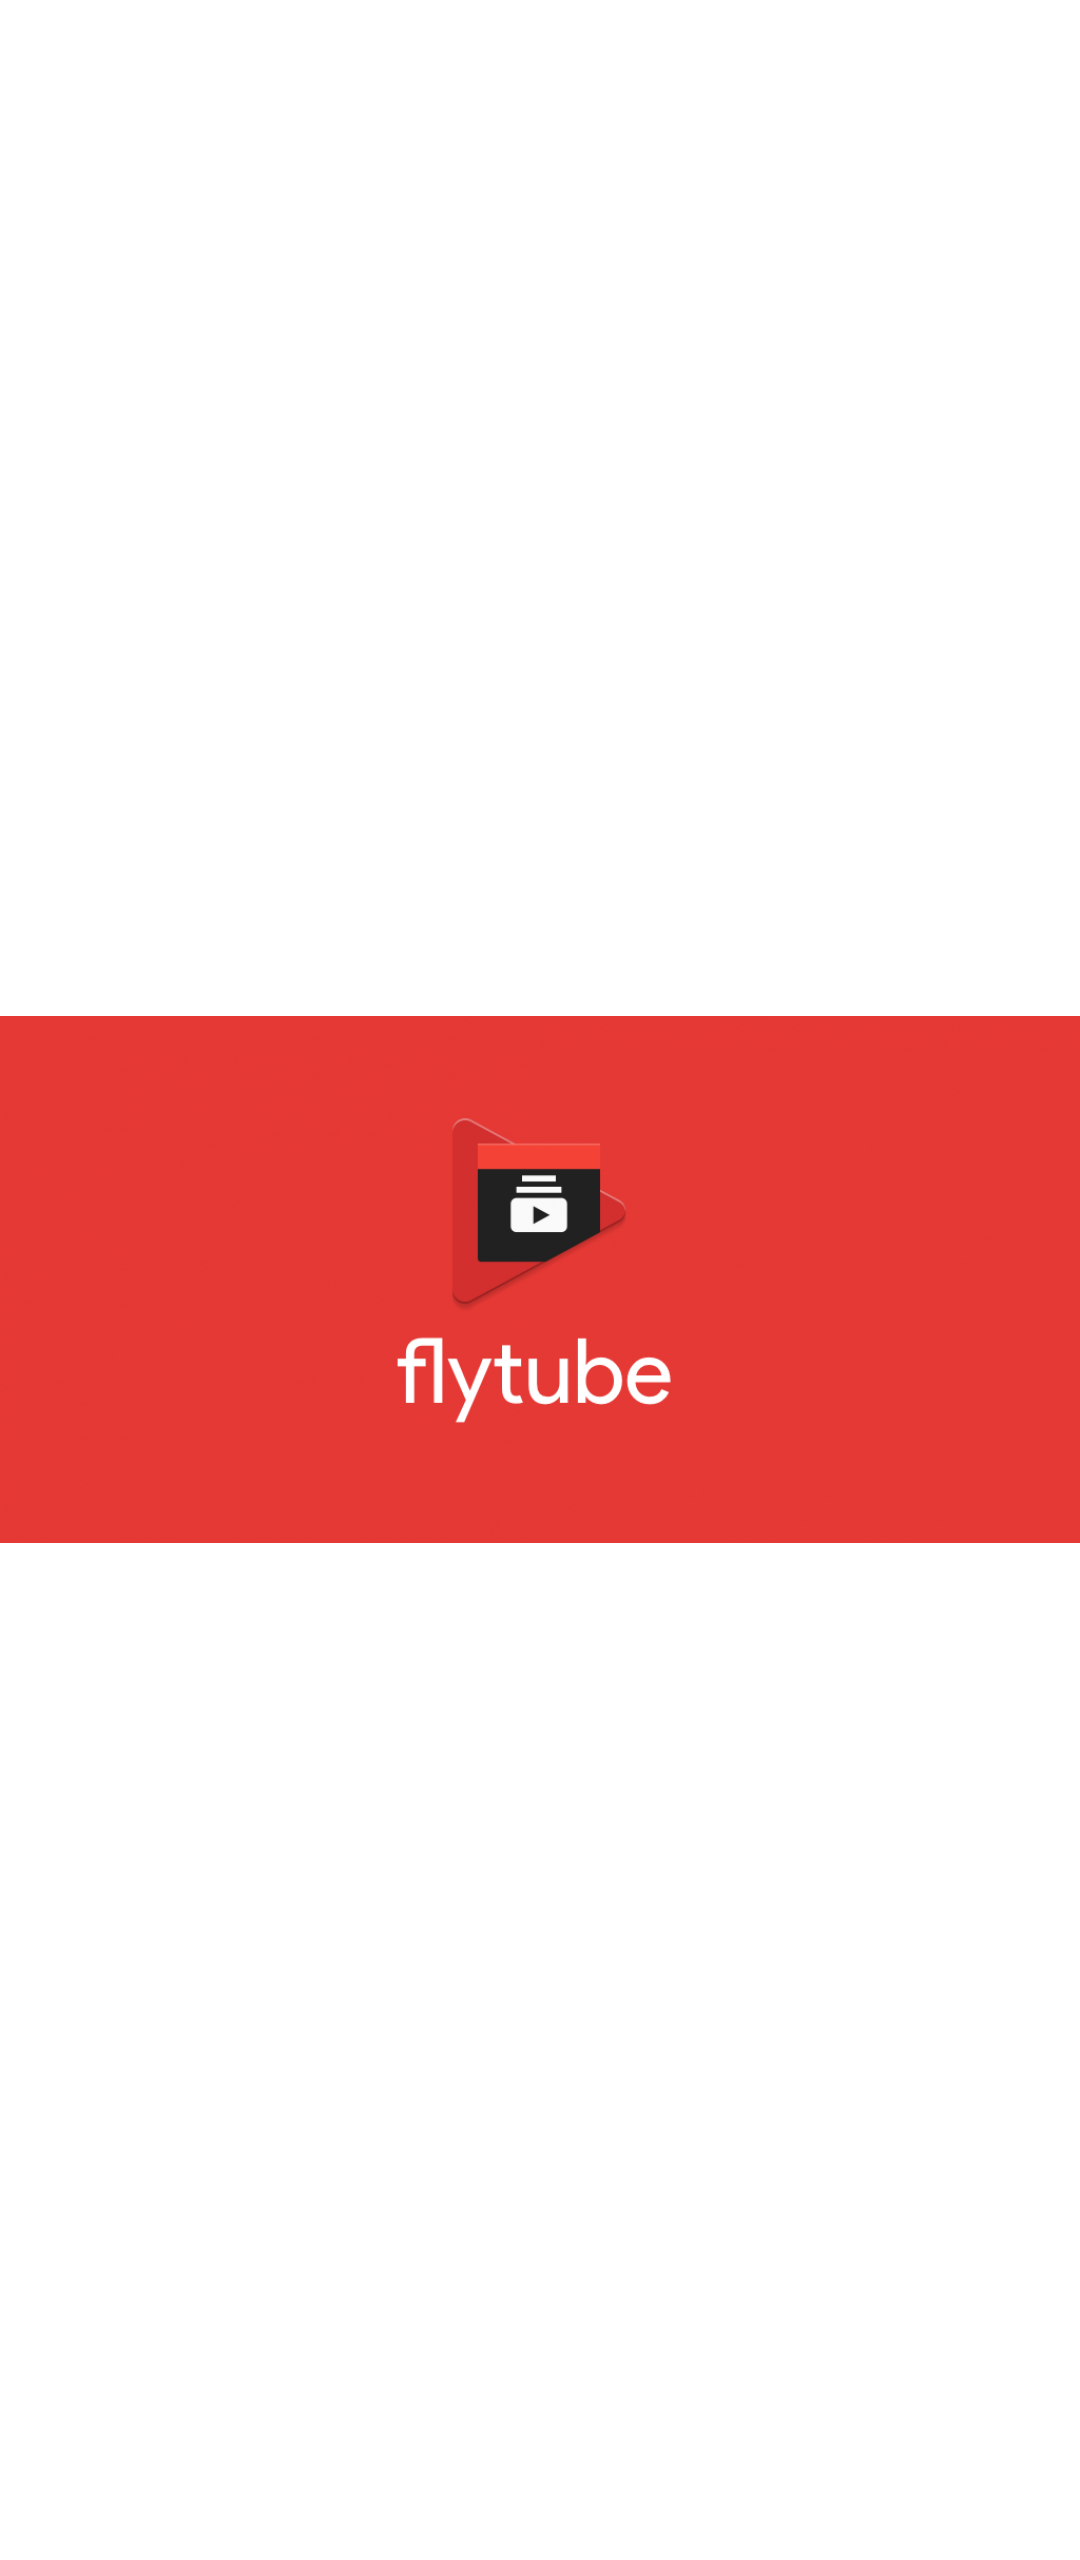 Flytube te permite ver videos de YouTube flotantes en Android